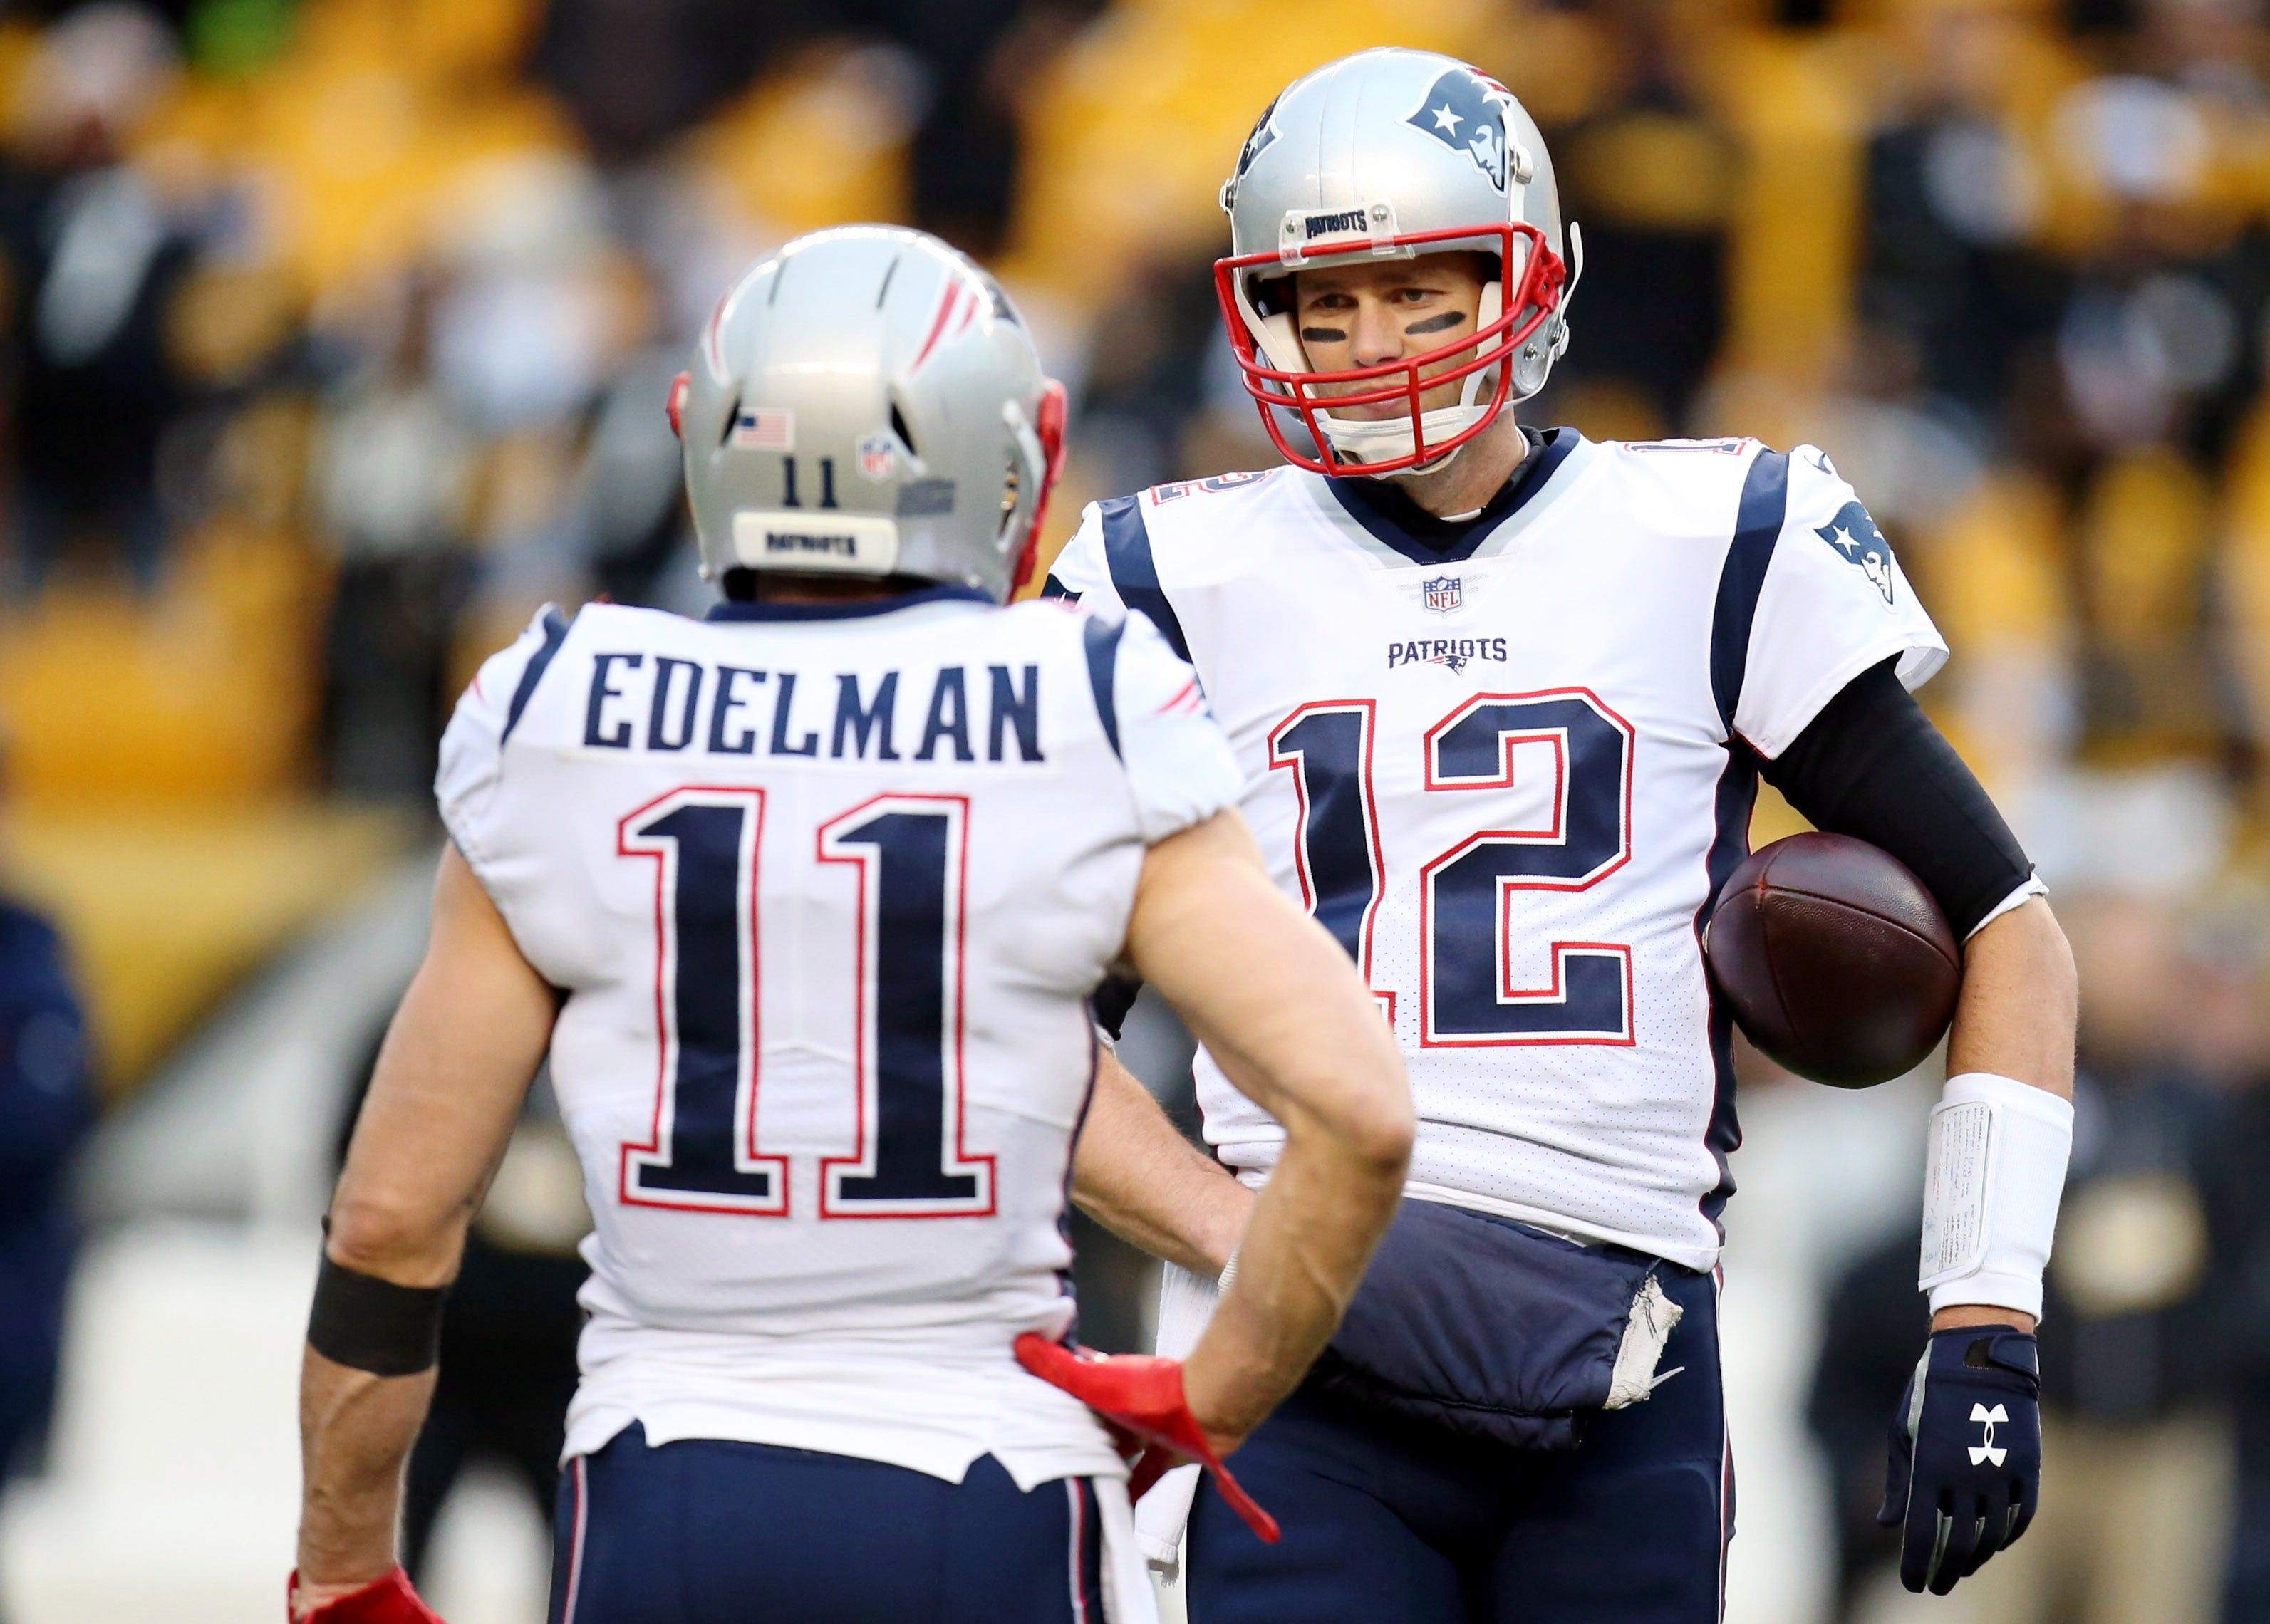 Watch: Tom Brady throws passes to Julian Edelman at Boston College